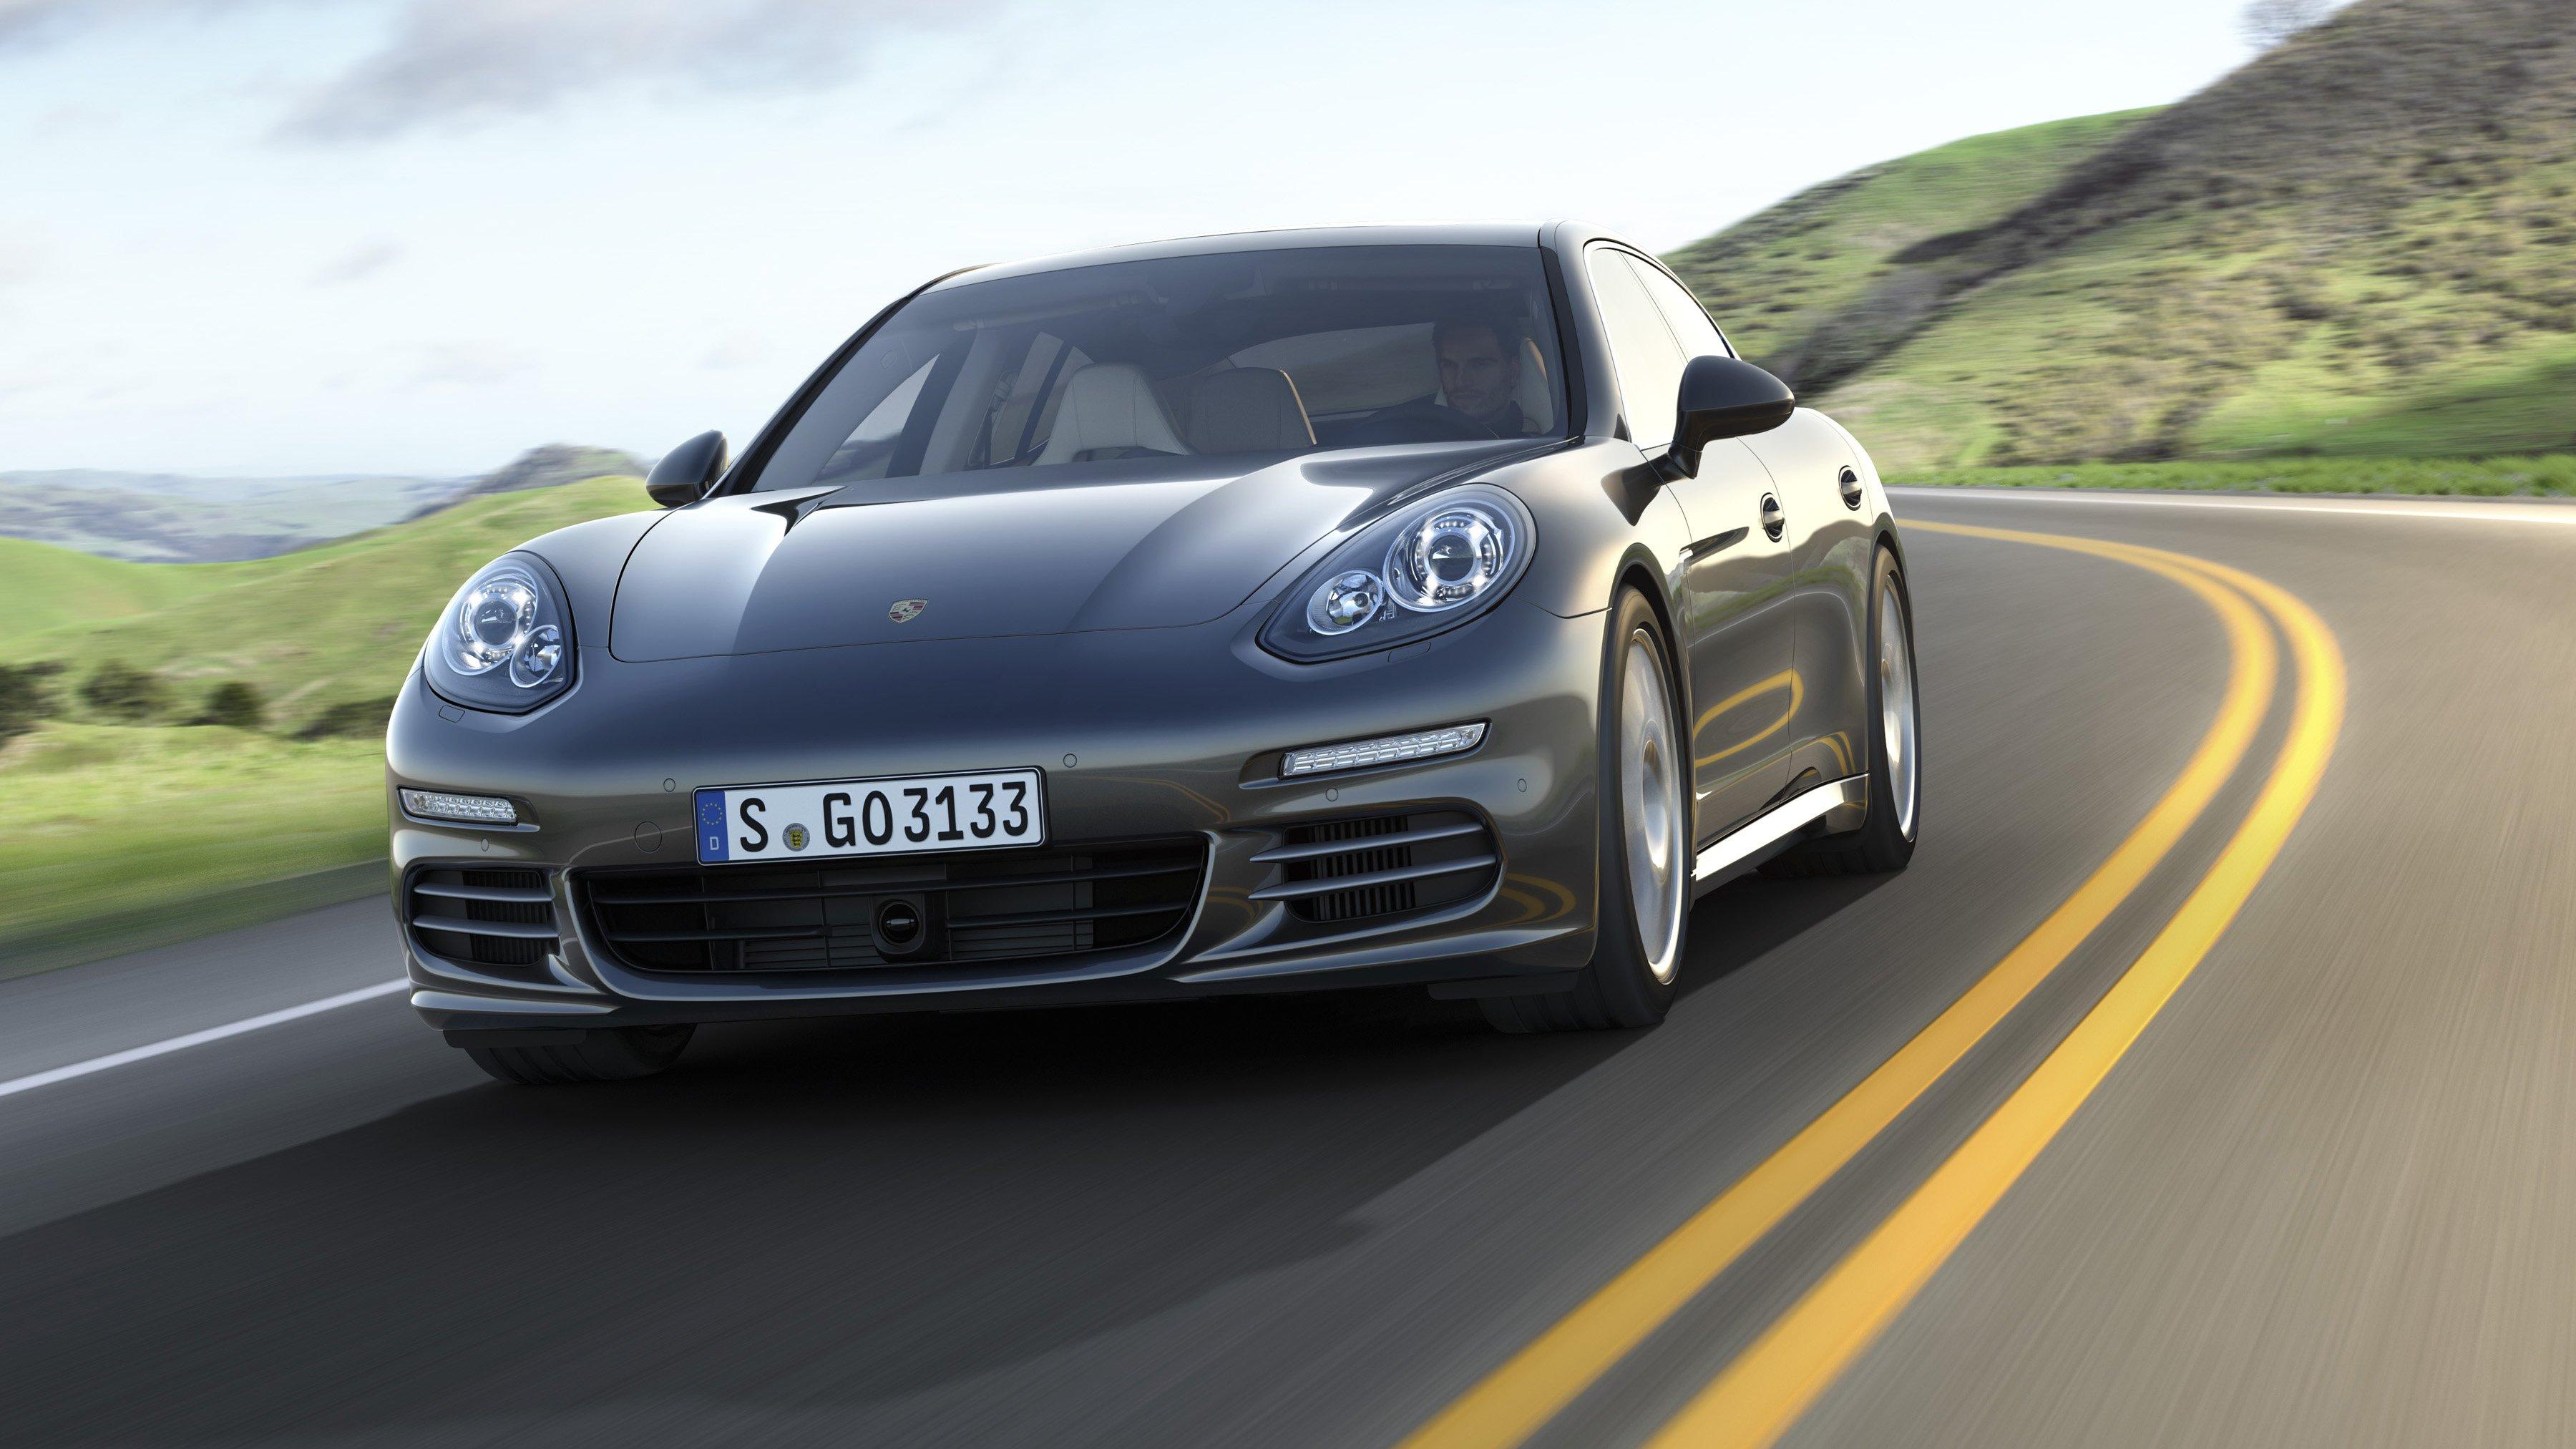 Porsche Panamera Turbo 2014 Photo - 1